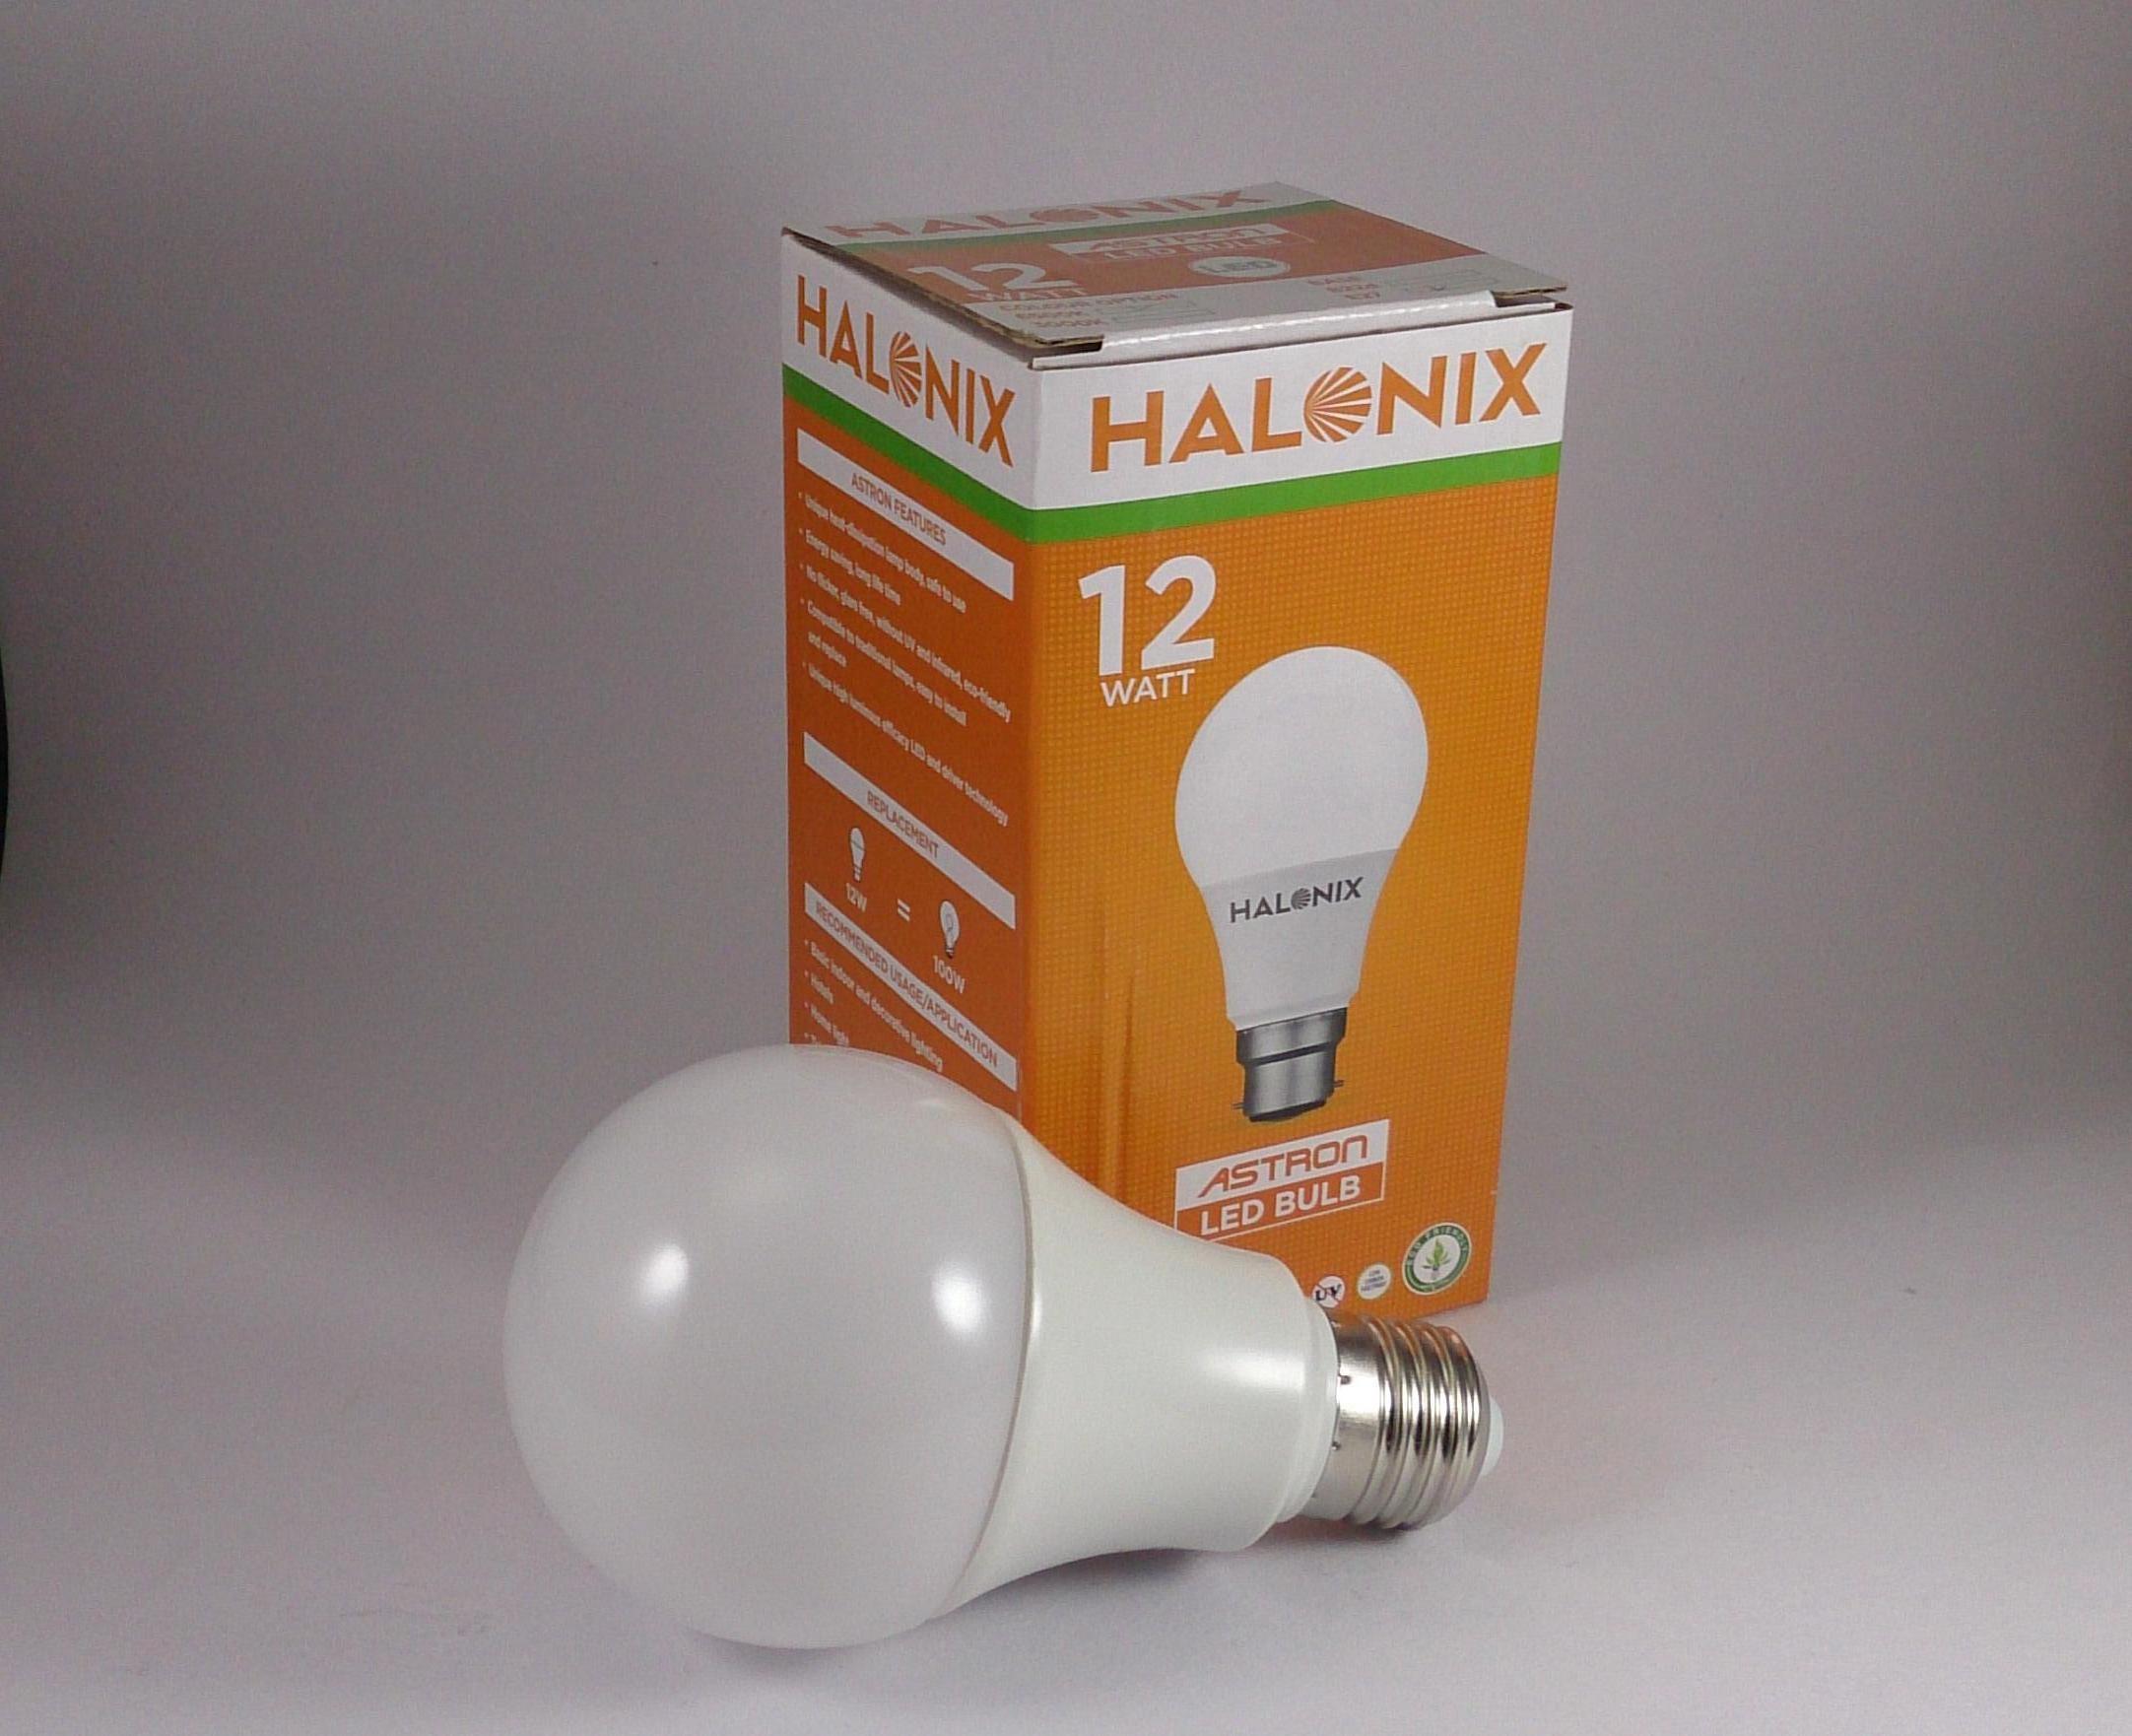 astron-led-bulb-12-watt-yellow-e27-halonix-original-imae8yb7cskjzkgw Faszinierend Led E27 12 Watt Dekorationen